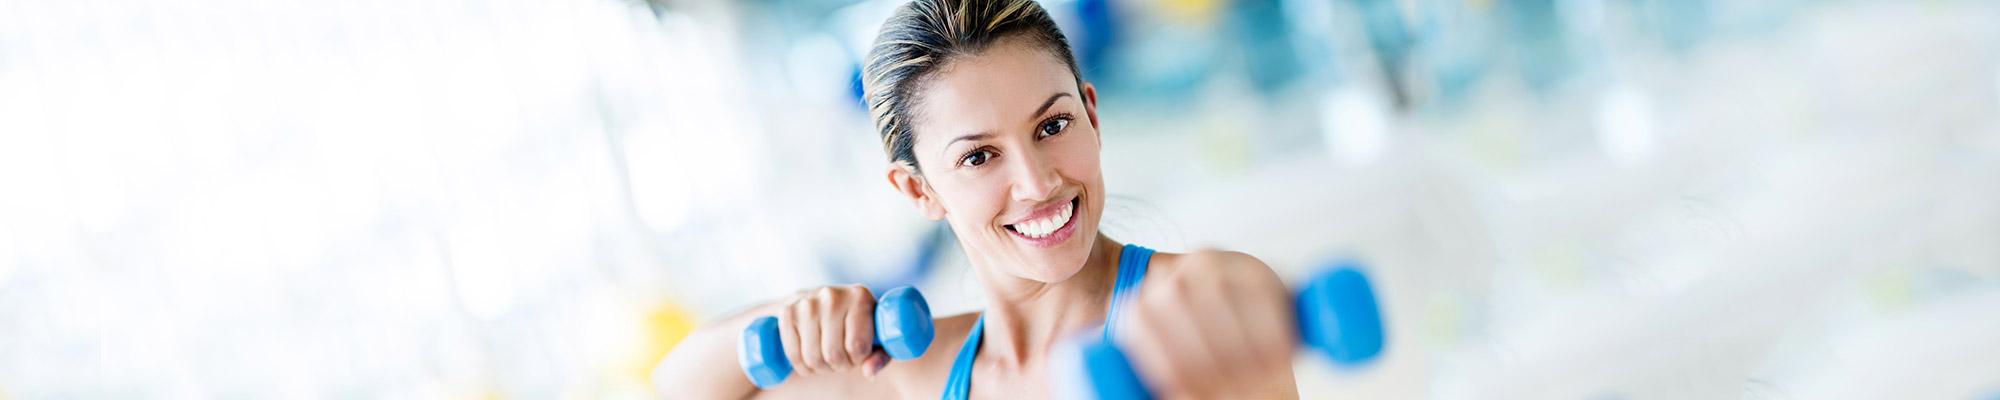 Fitnesskurse Marktheidenfeld